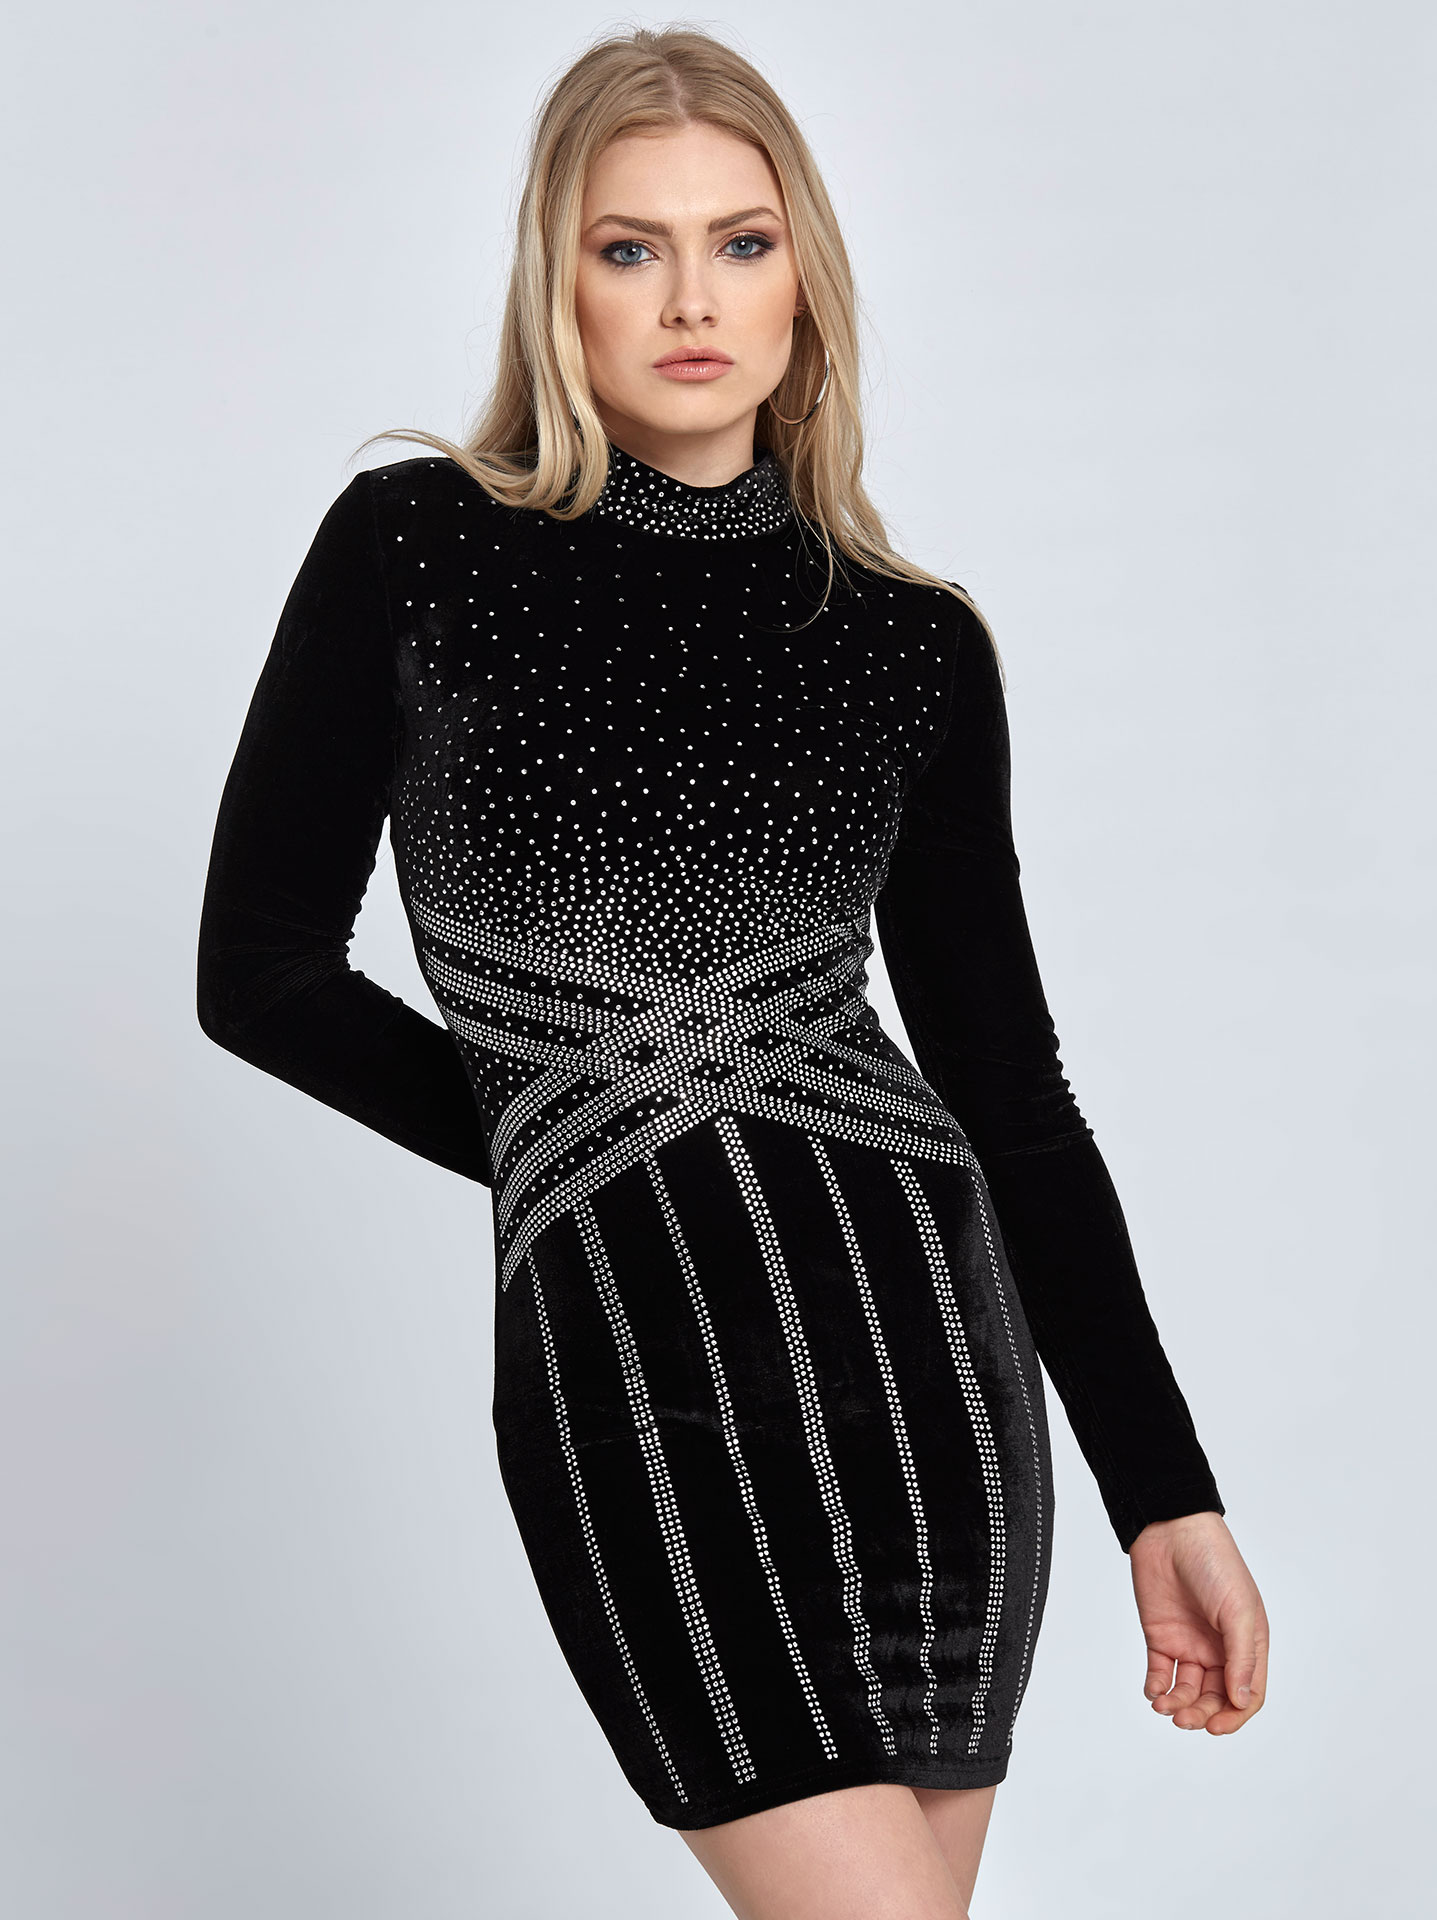 Mini βελούδινο φόρεμα με strass σε μαυρο 22cea7767d0